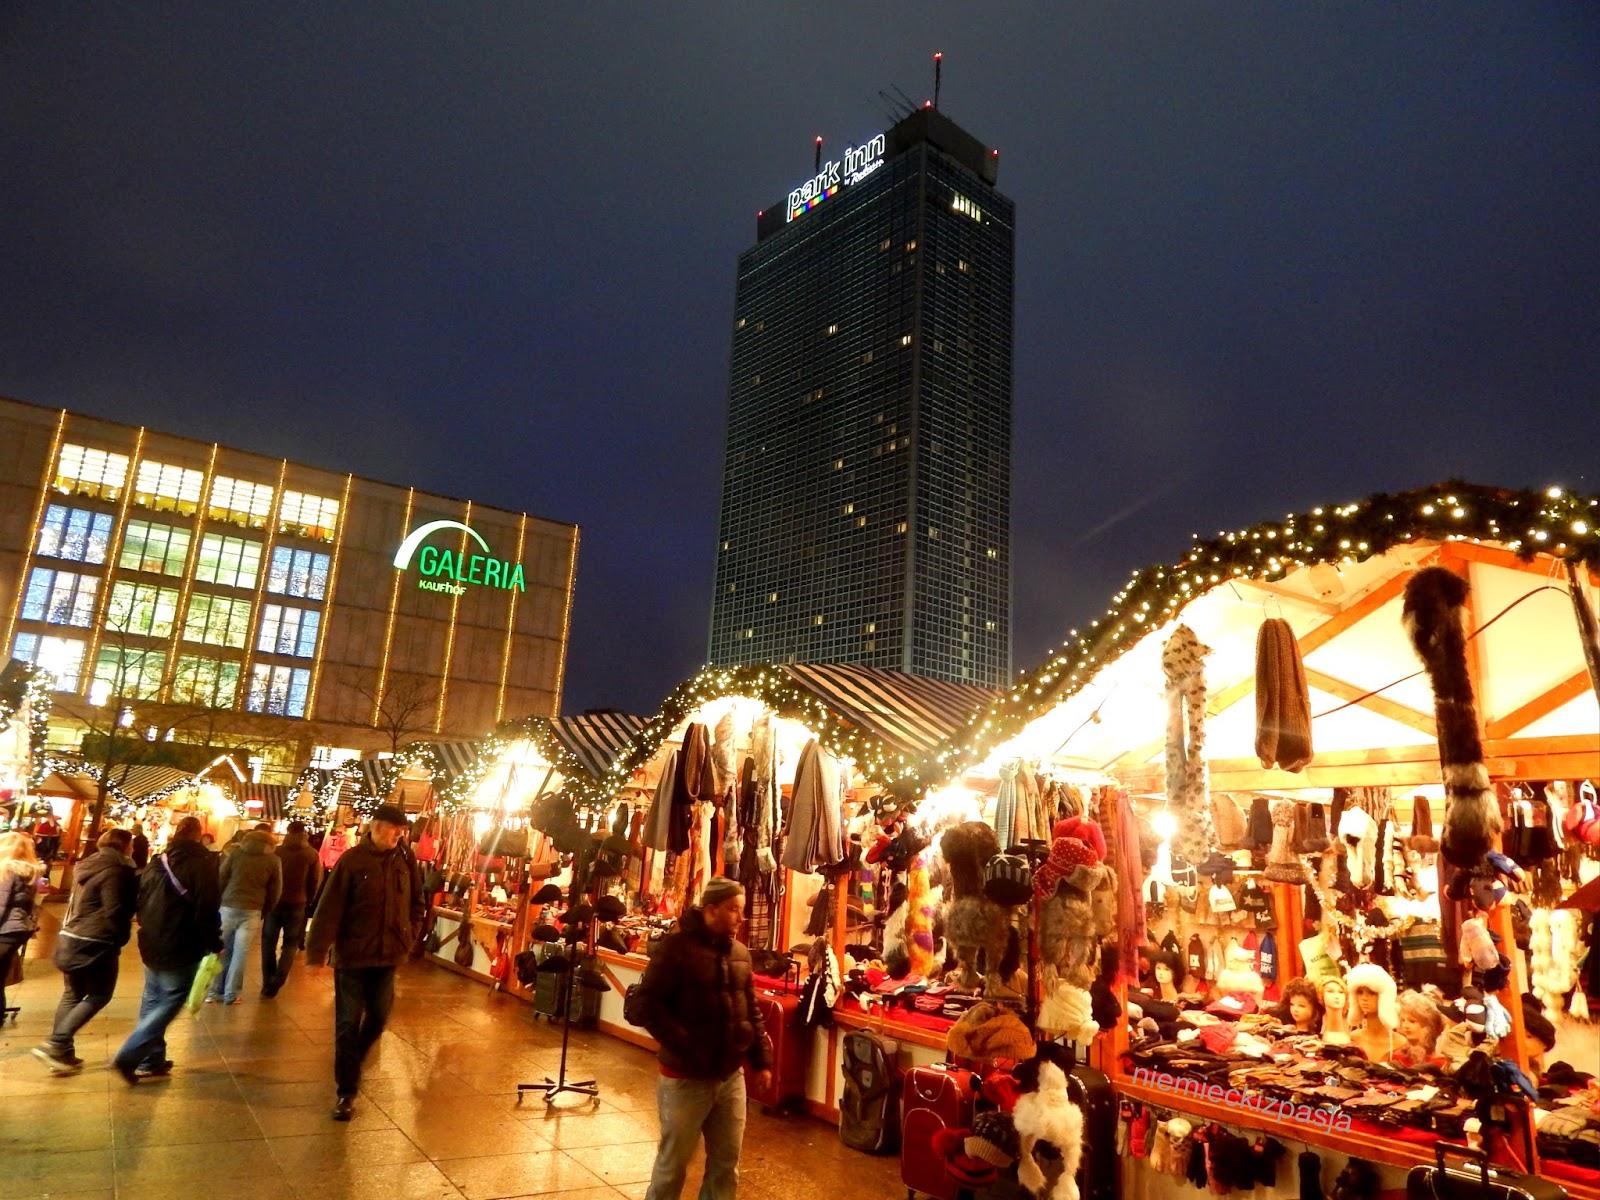 Weihnachtsmarkt W.Weihnachtsmarkt Am Alexanderplatz In Berlin Kiermasz świąteczny